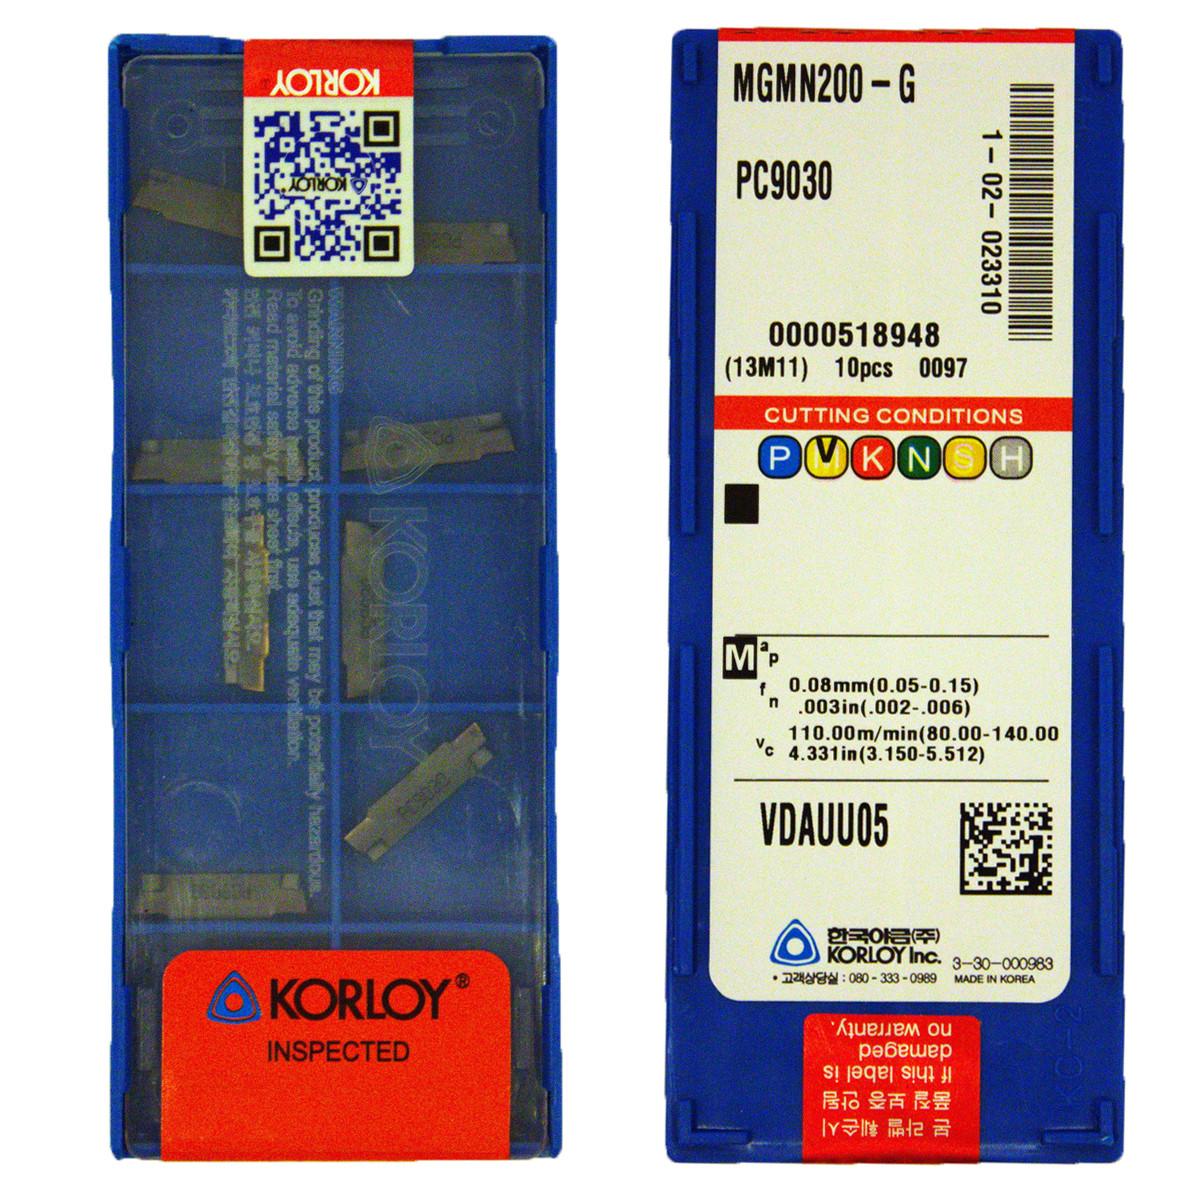 Пластина KОRLOY MGMN200-G PC9030